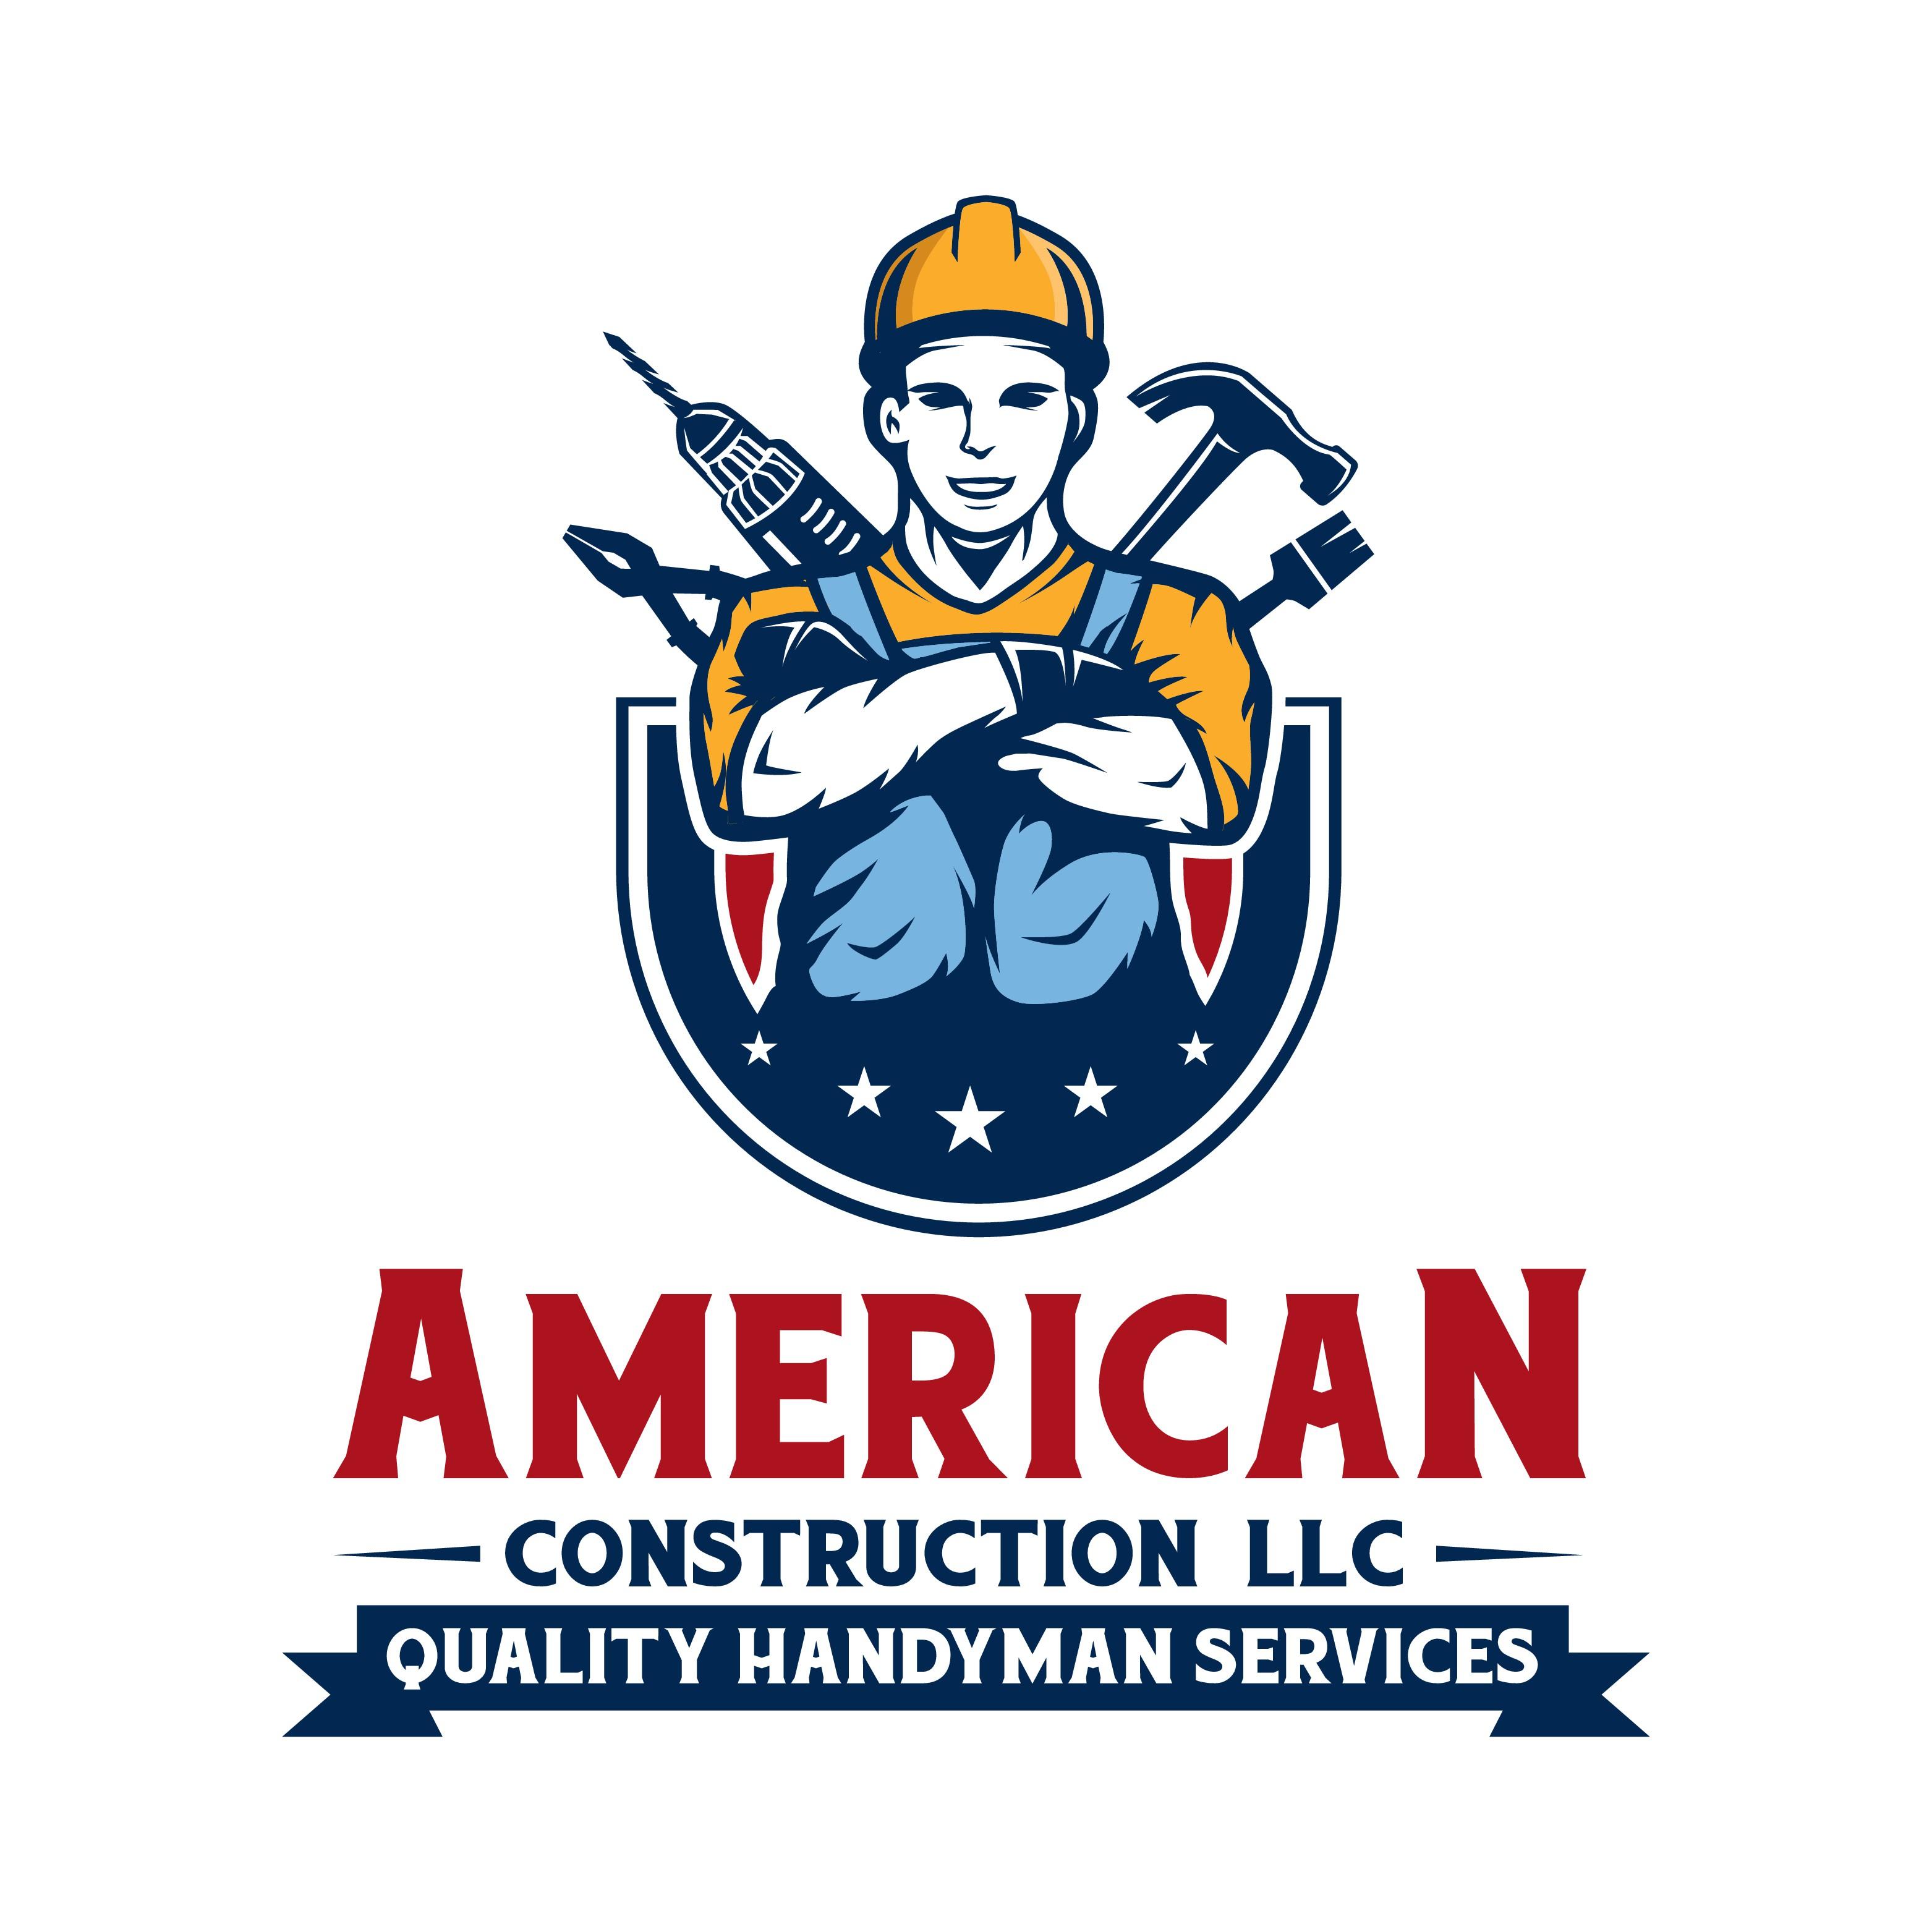 American Construction, LLC